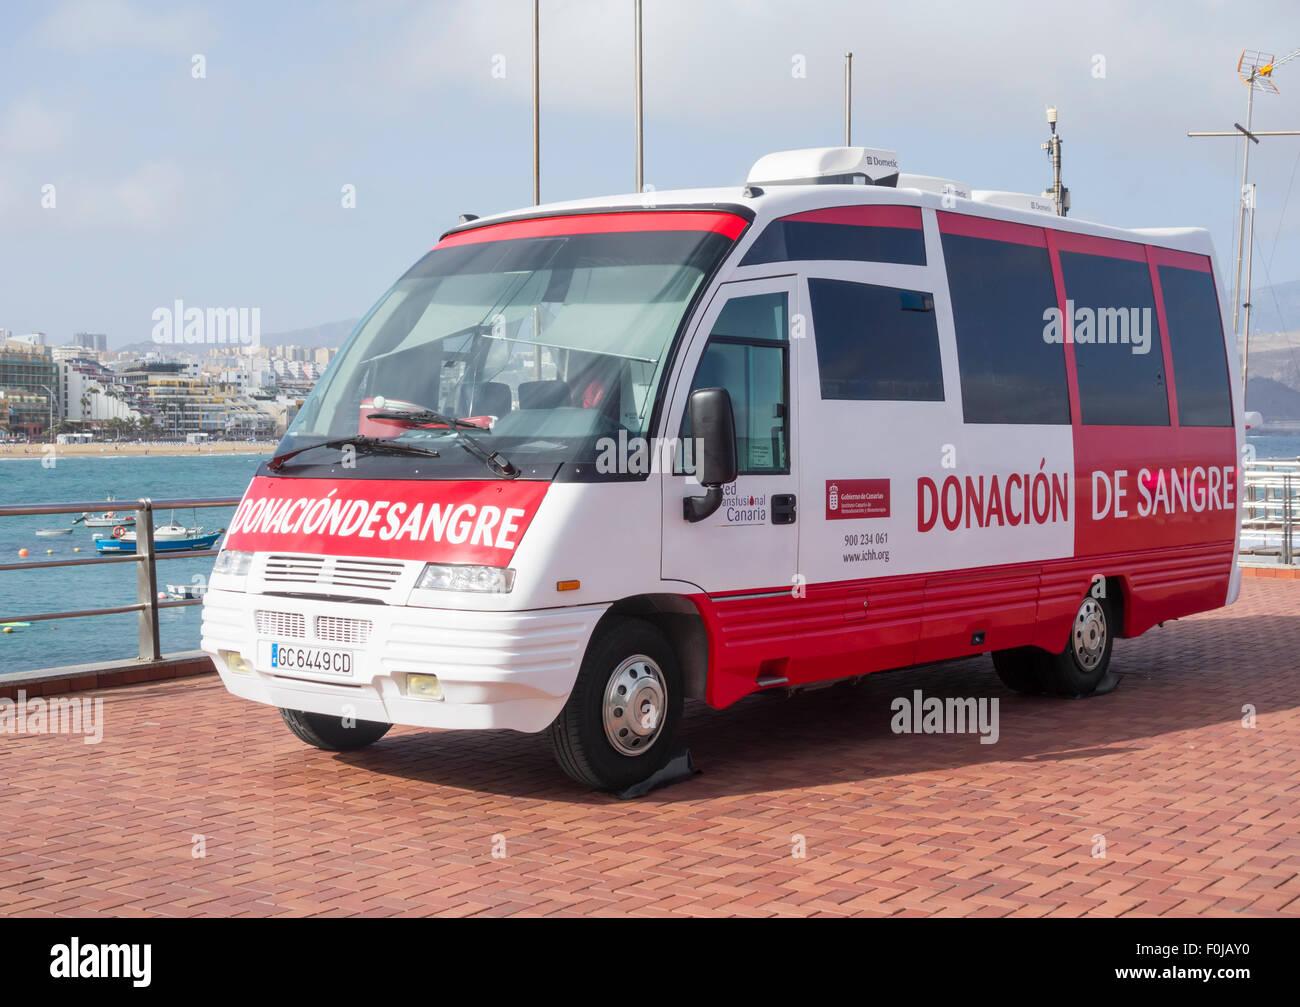 Blood Donation (Donation de Sangre) bus near beach in Spain Stock Photo